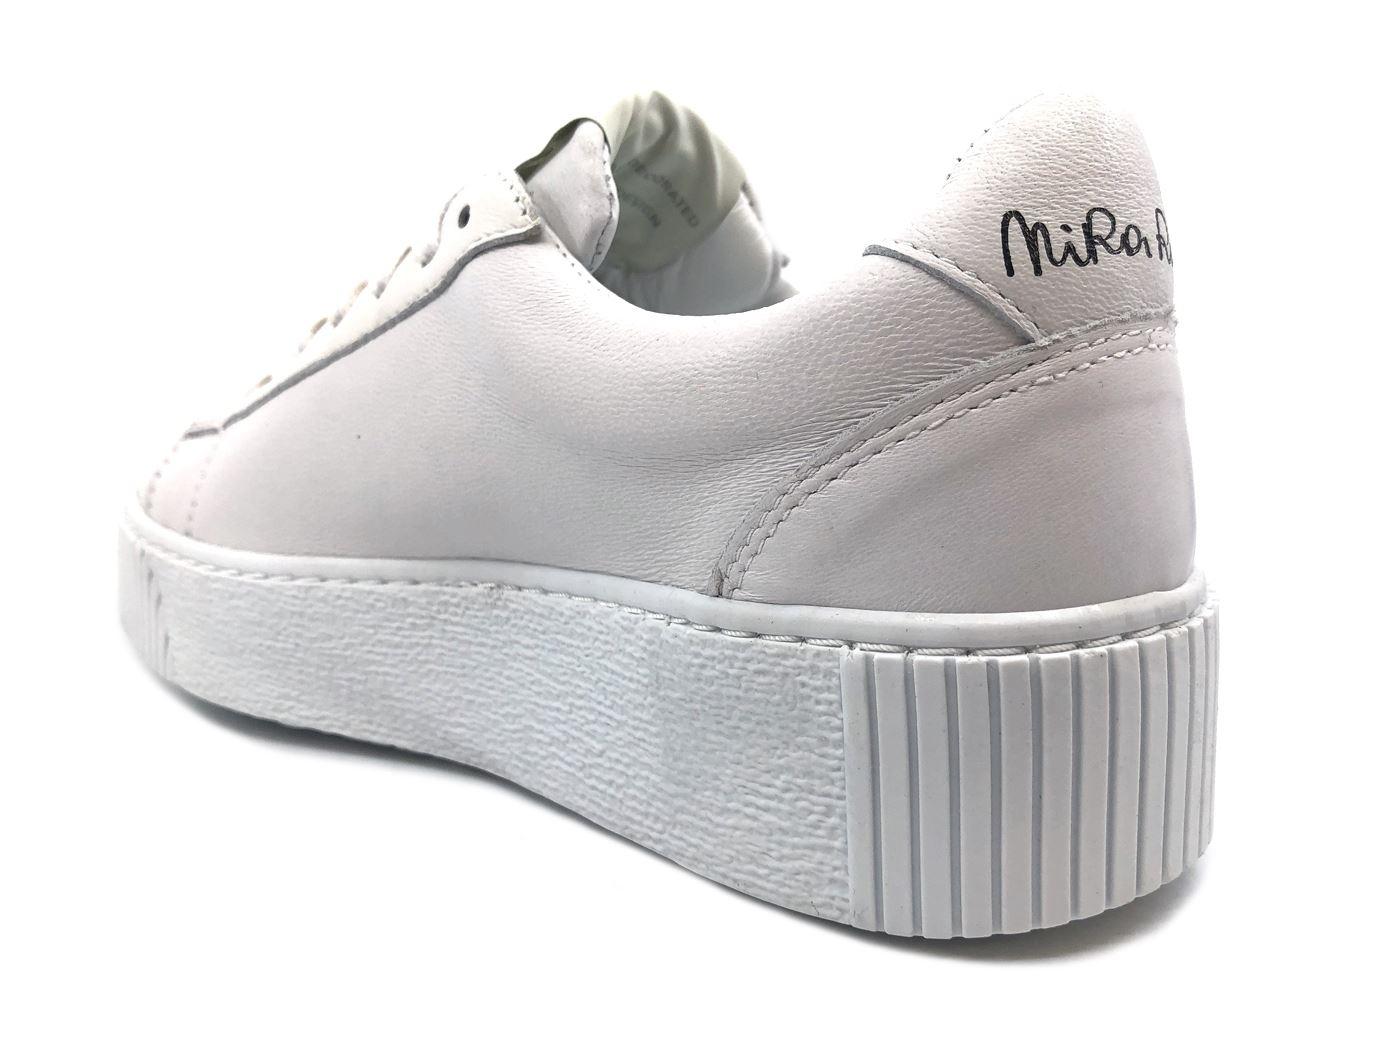 NIRA RUBENS COST15 COST15 COST15 scarpe da ginnastica DONNA IN PELLE BIANCA MainApps 9ce426